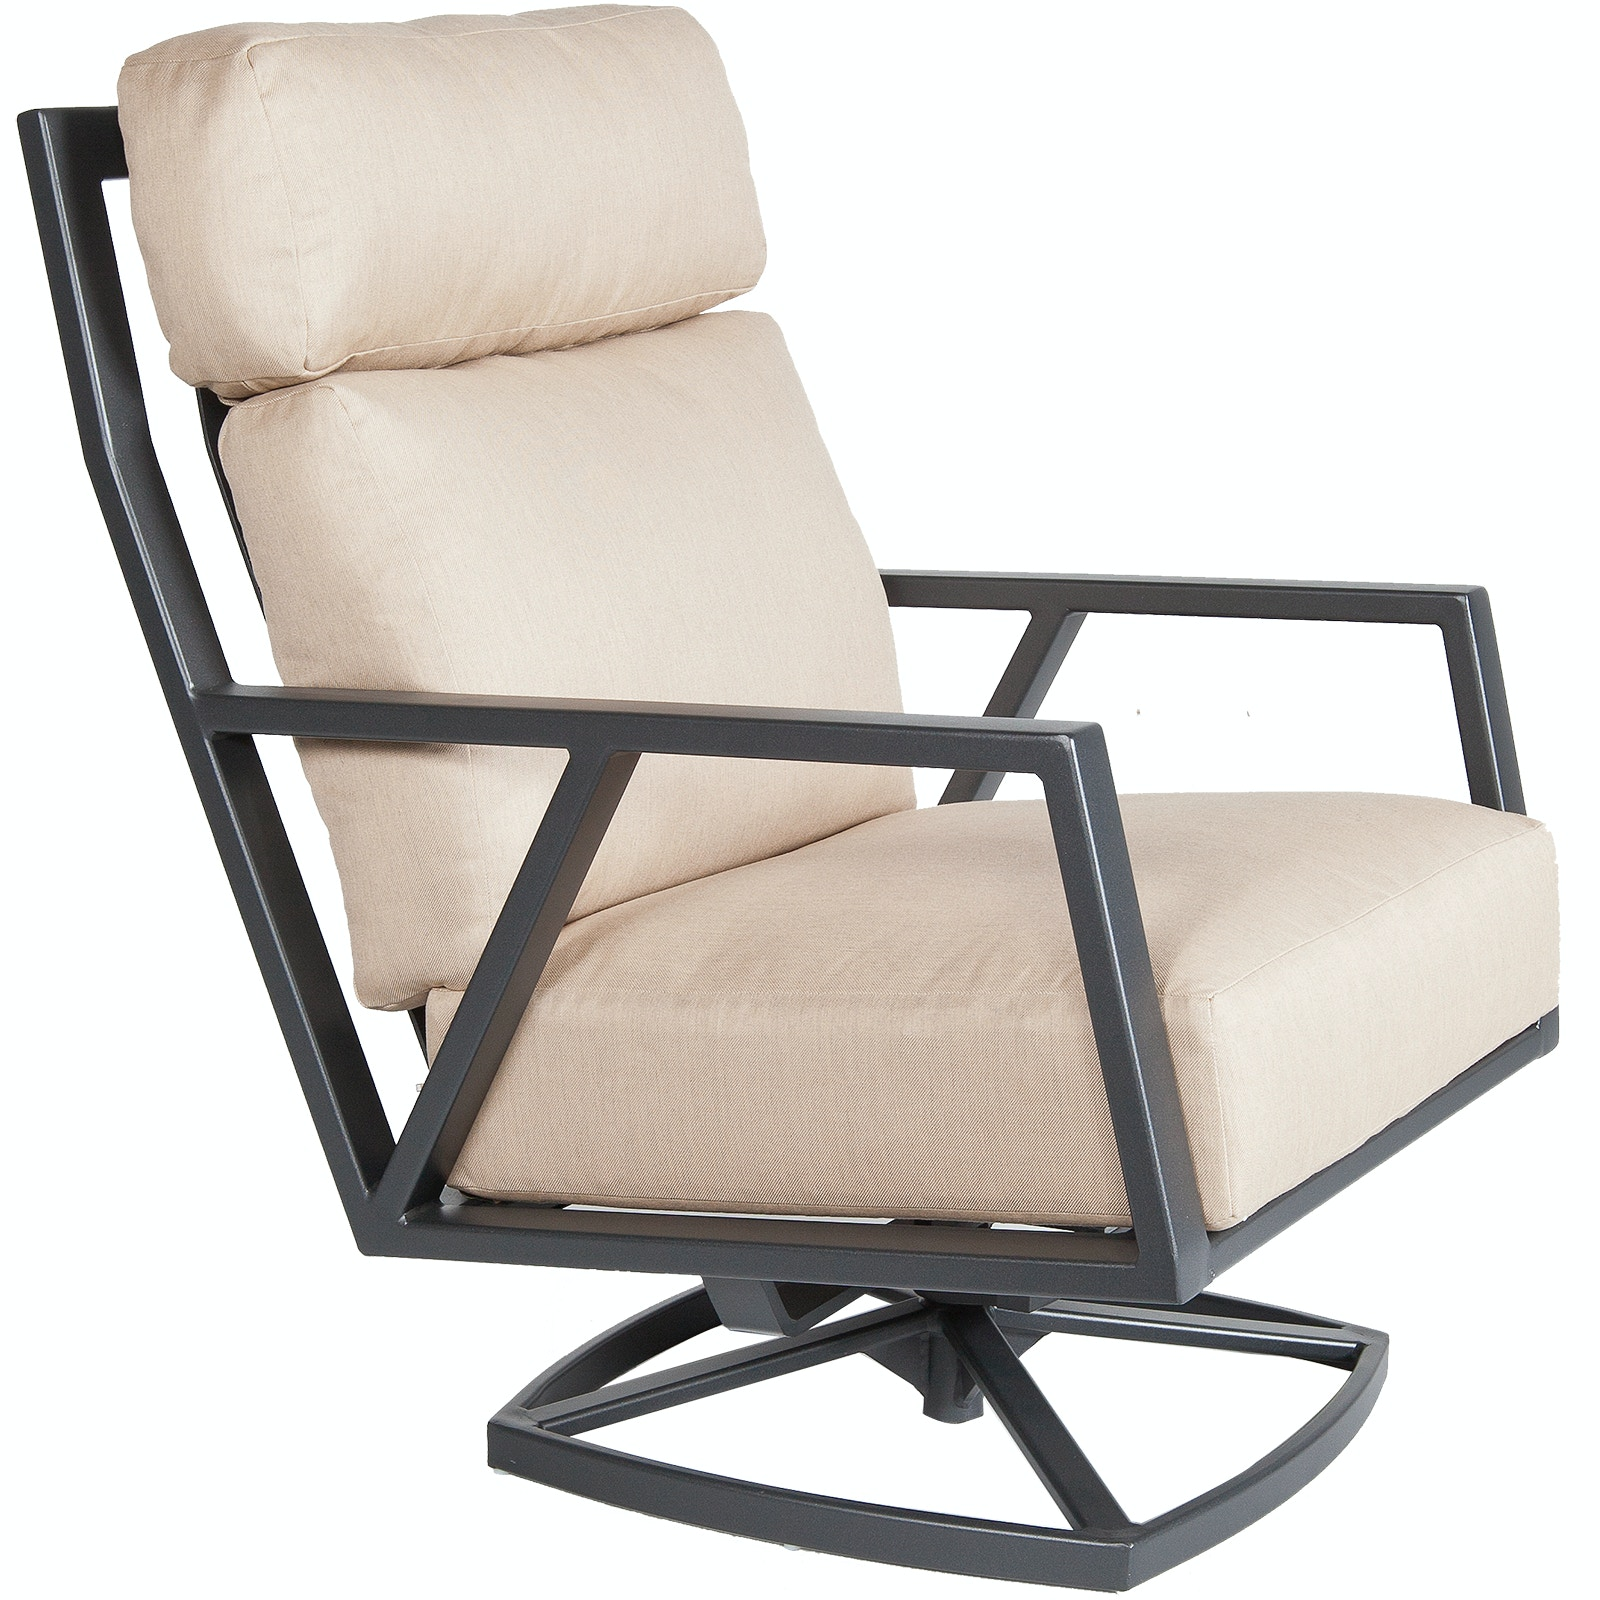 OW Lee Furniture Aris Swivel Rocker Lounge Chair Owlee Furniture 27175 SR